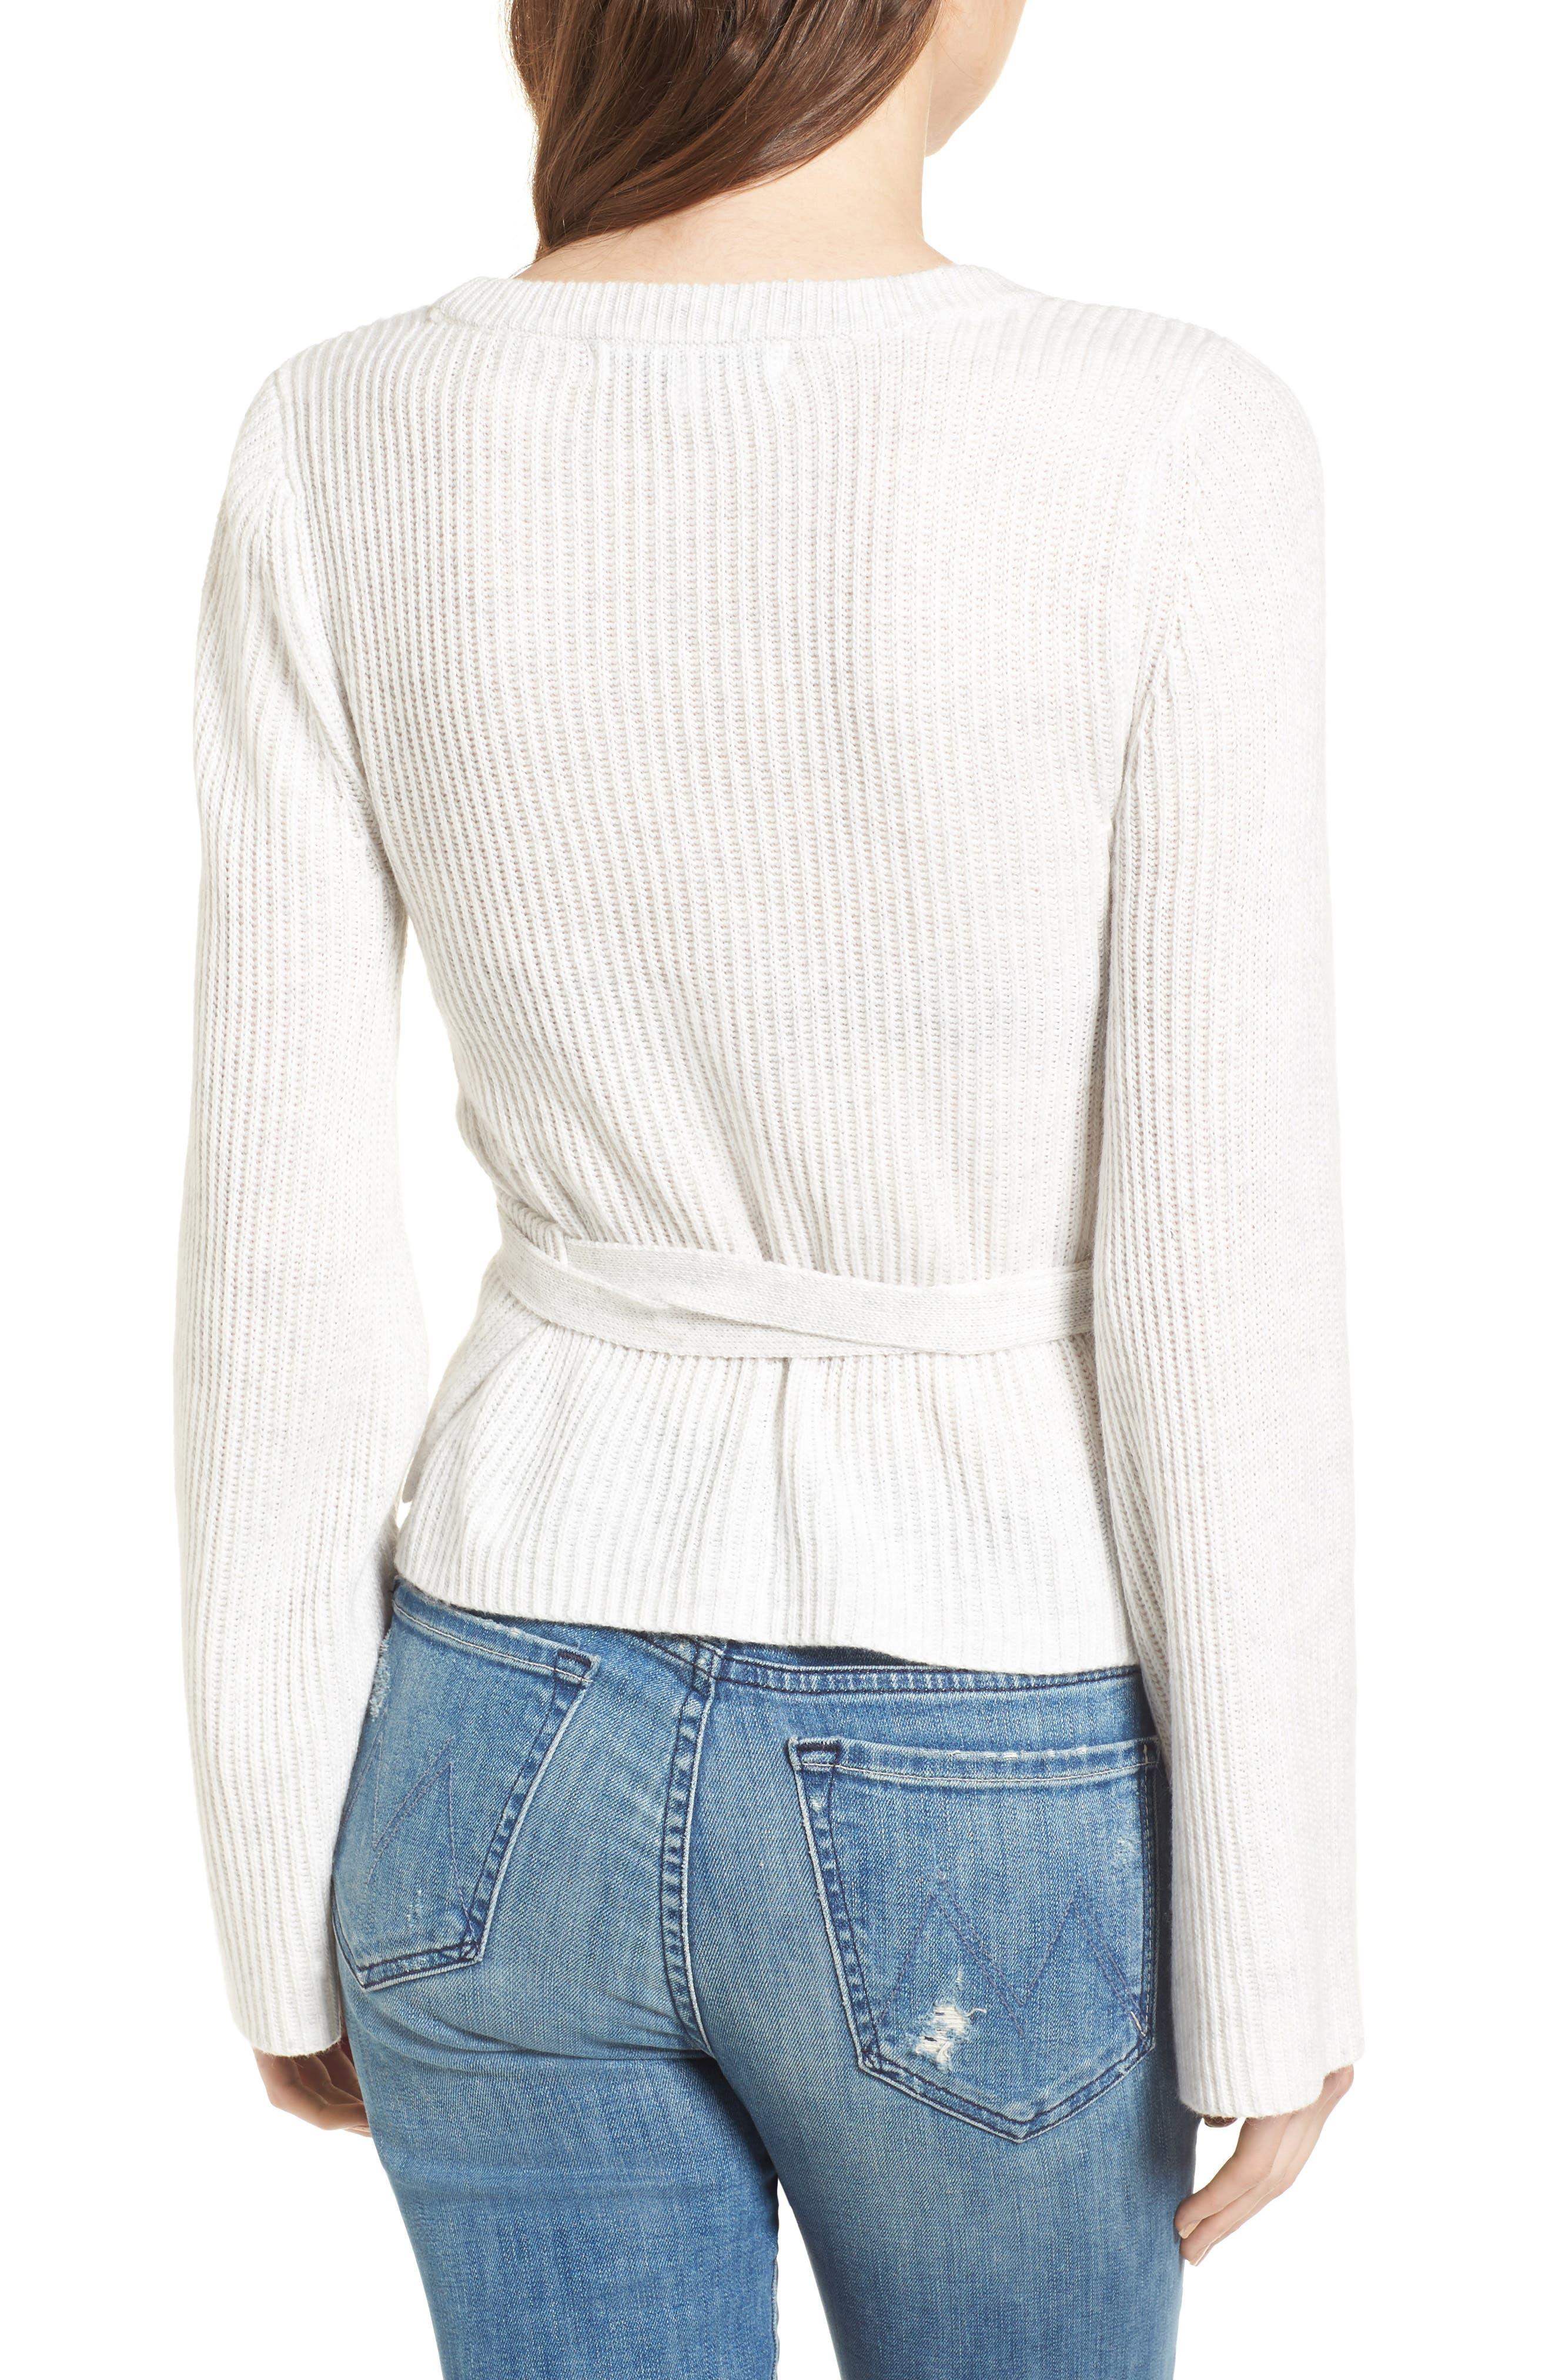 Chavi Tie Waist Sweater,                             Alternate thumbnail 2, color,                             050